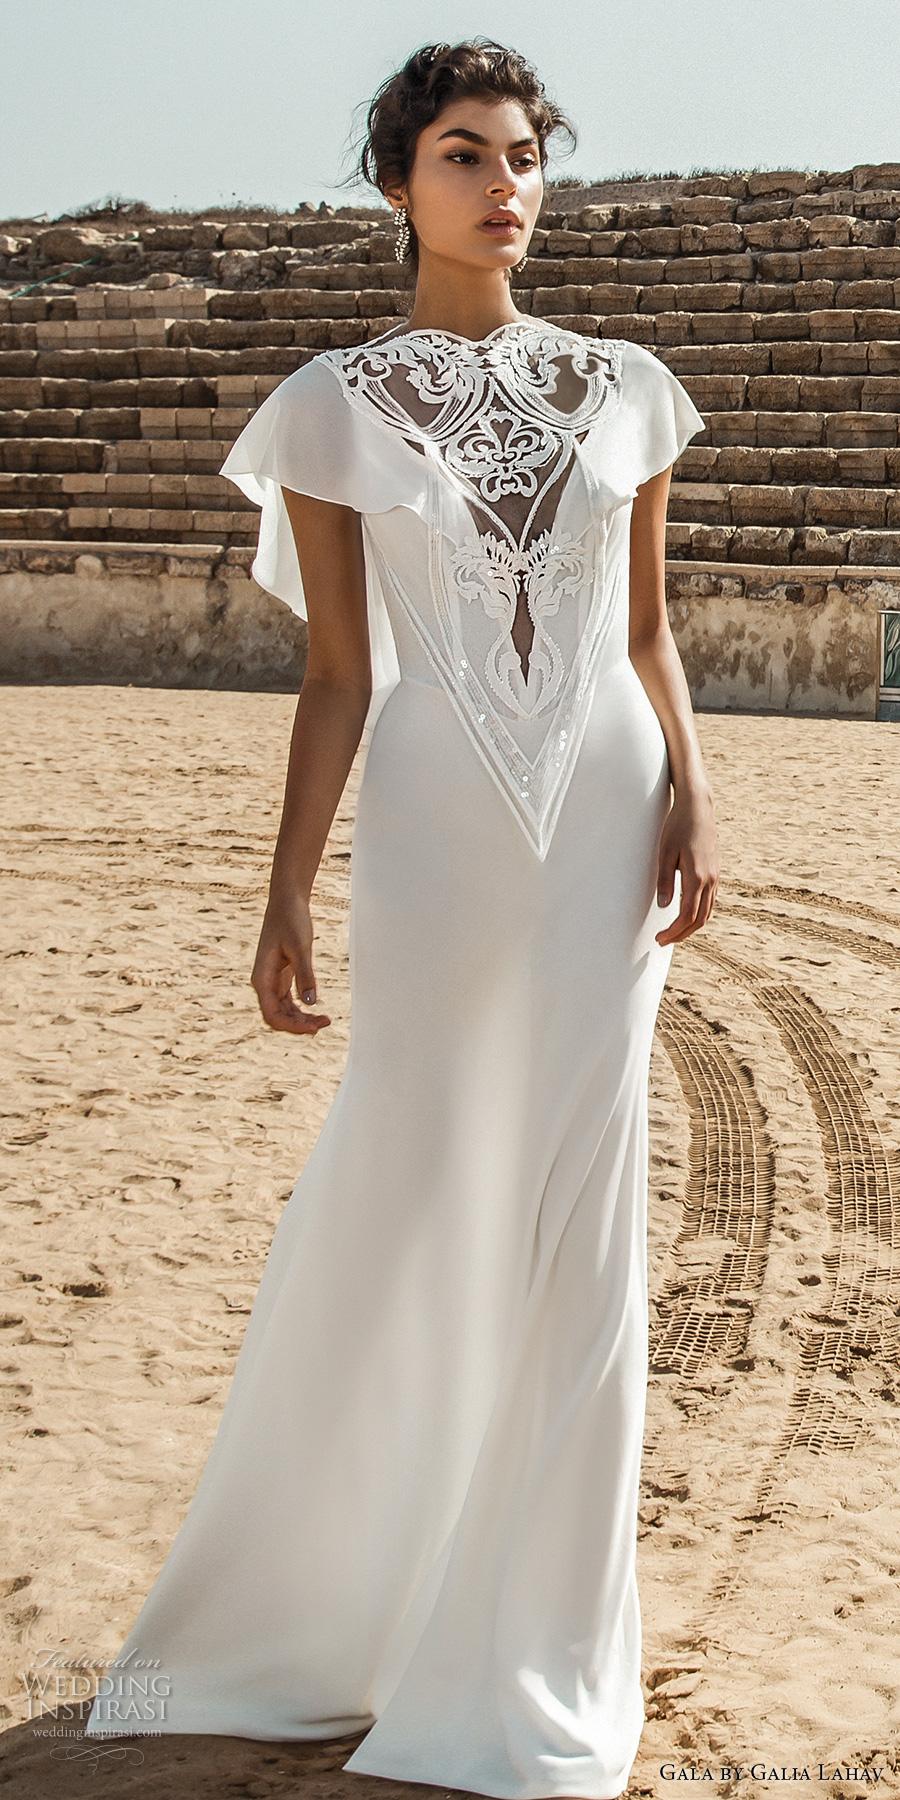 Www.wedding Dress 69 Luxury galia lahav gala bridal